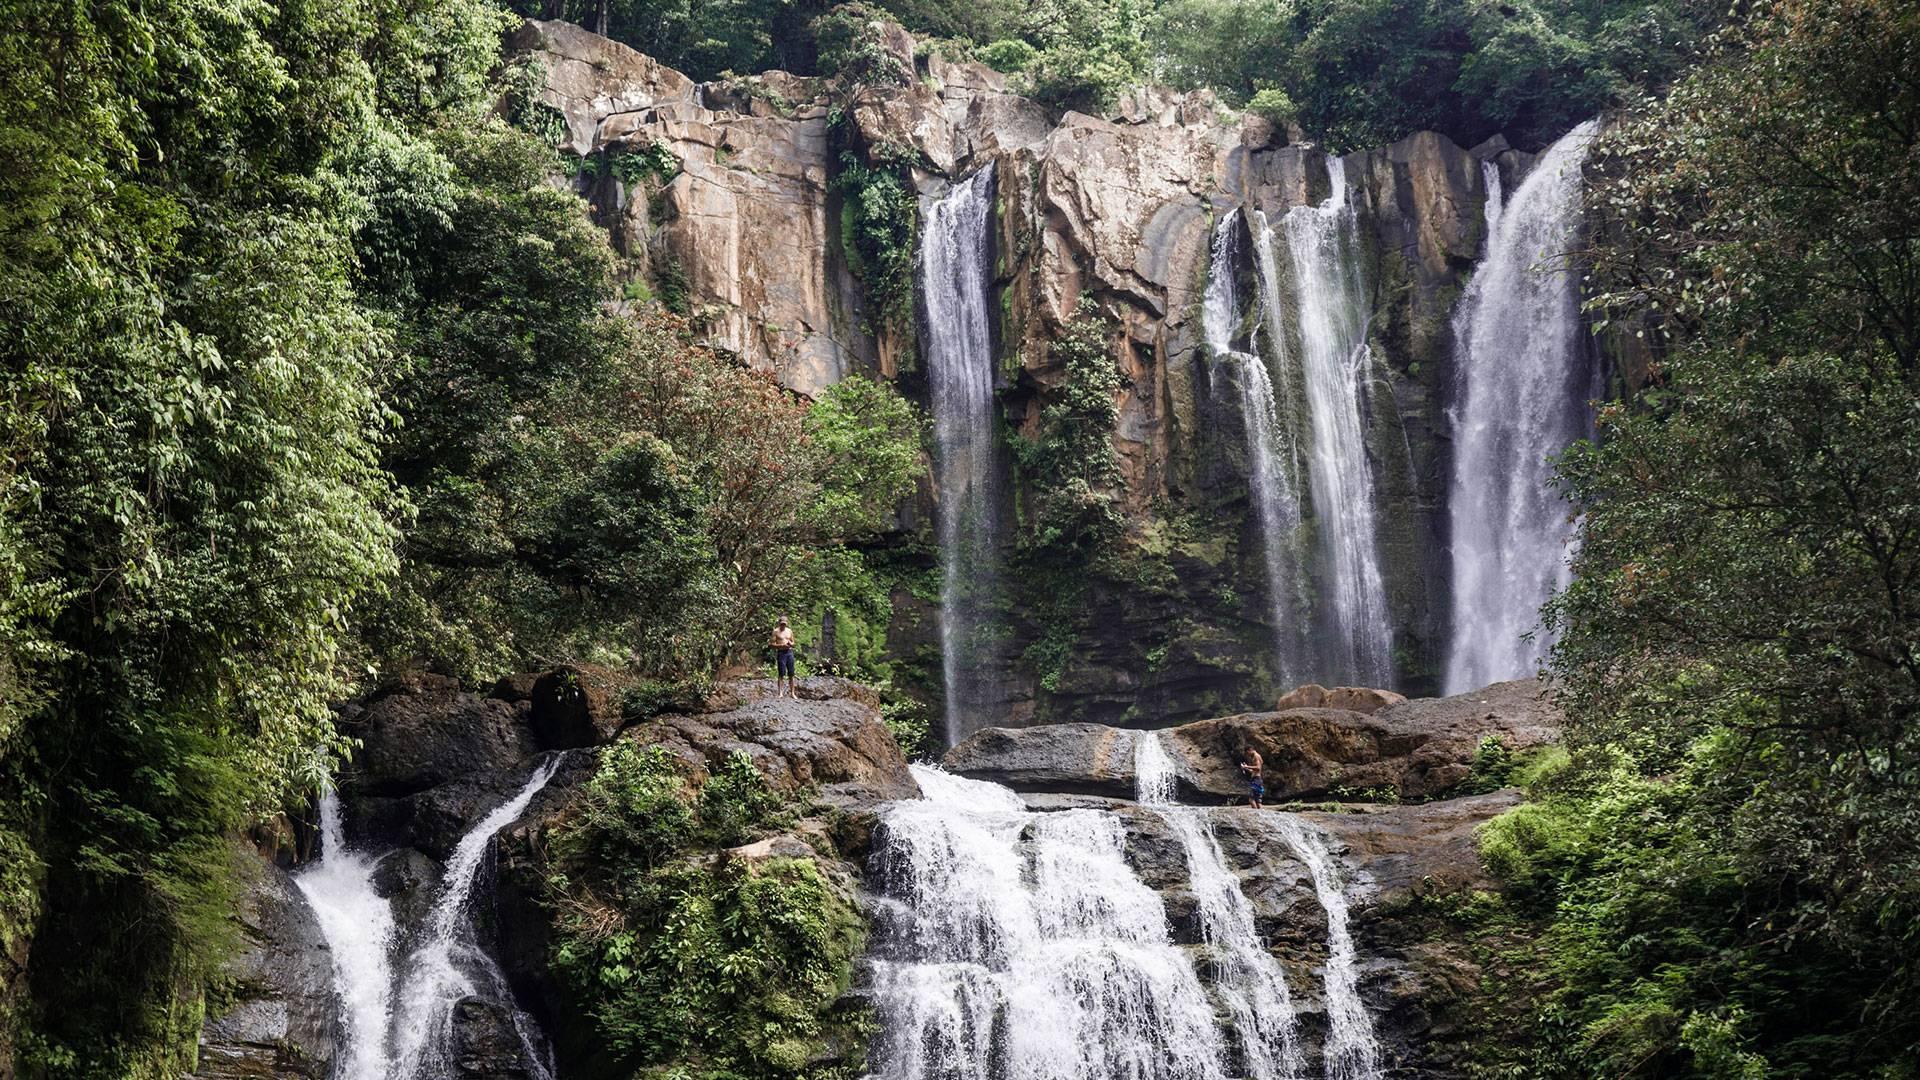 Photo 2: NAUYACA CASCADES